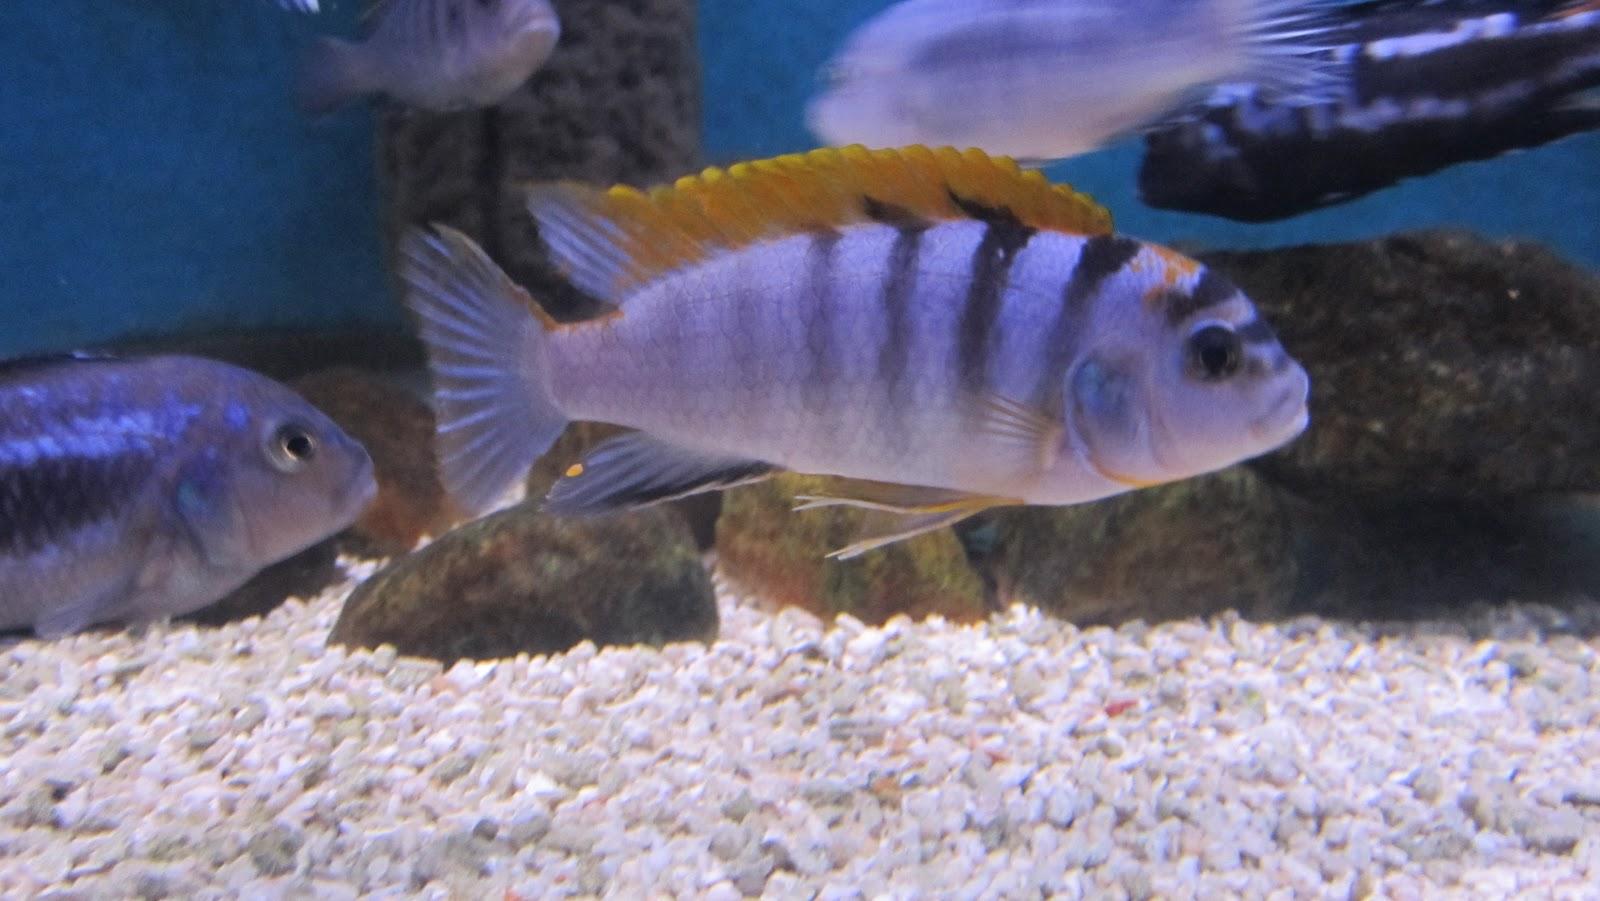 ... hongi labidochromis sp hongi labidochromis sp hongi labidochromis sp